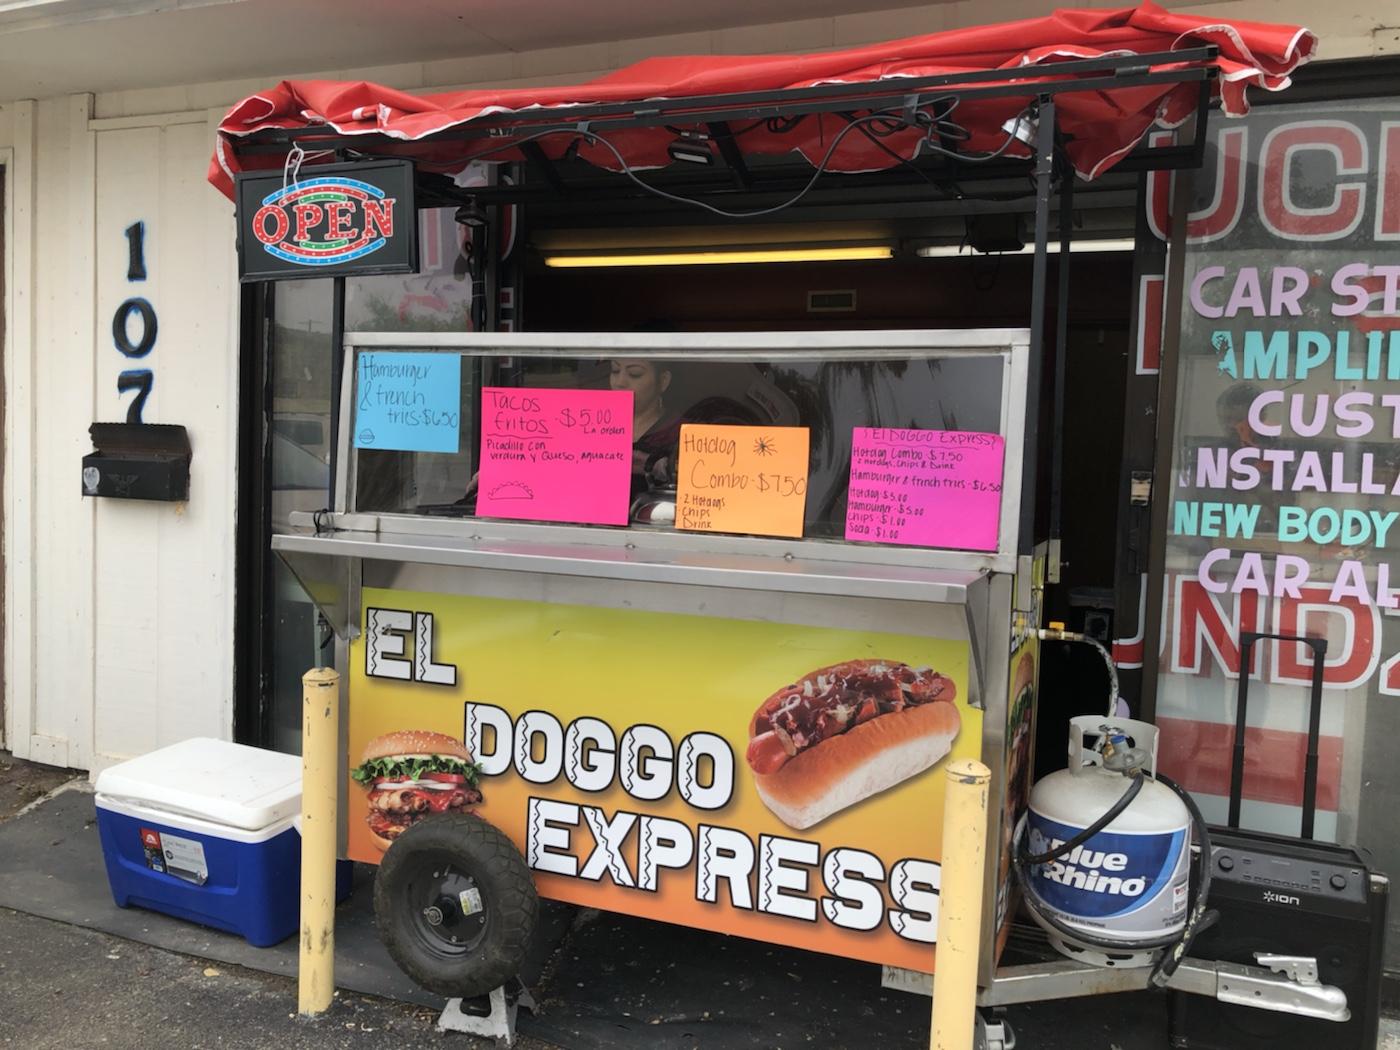 El Doggo Express